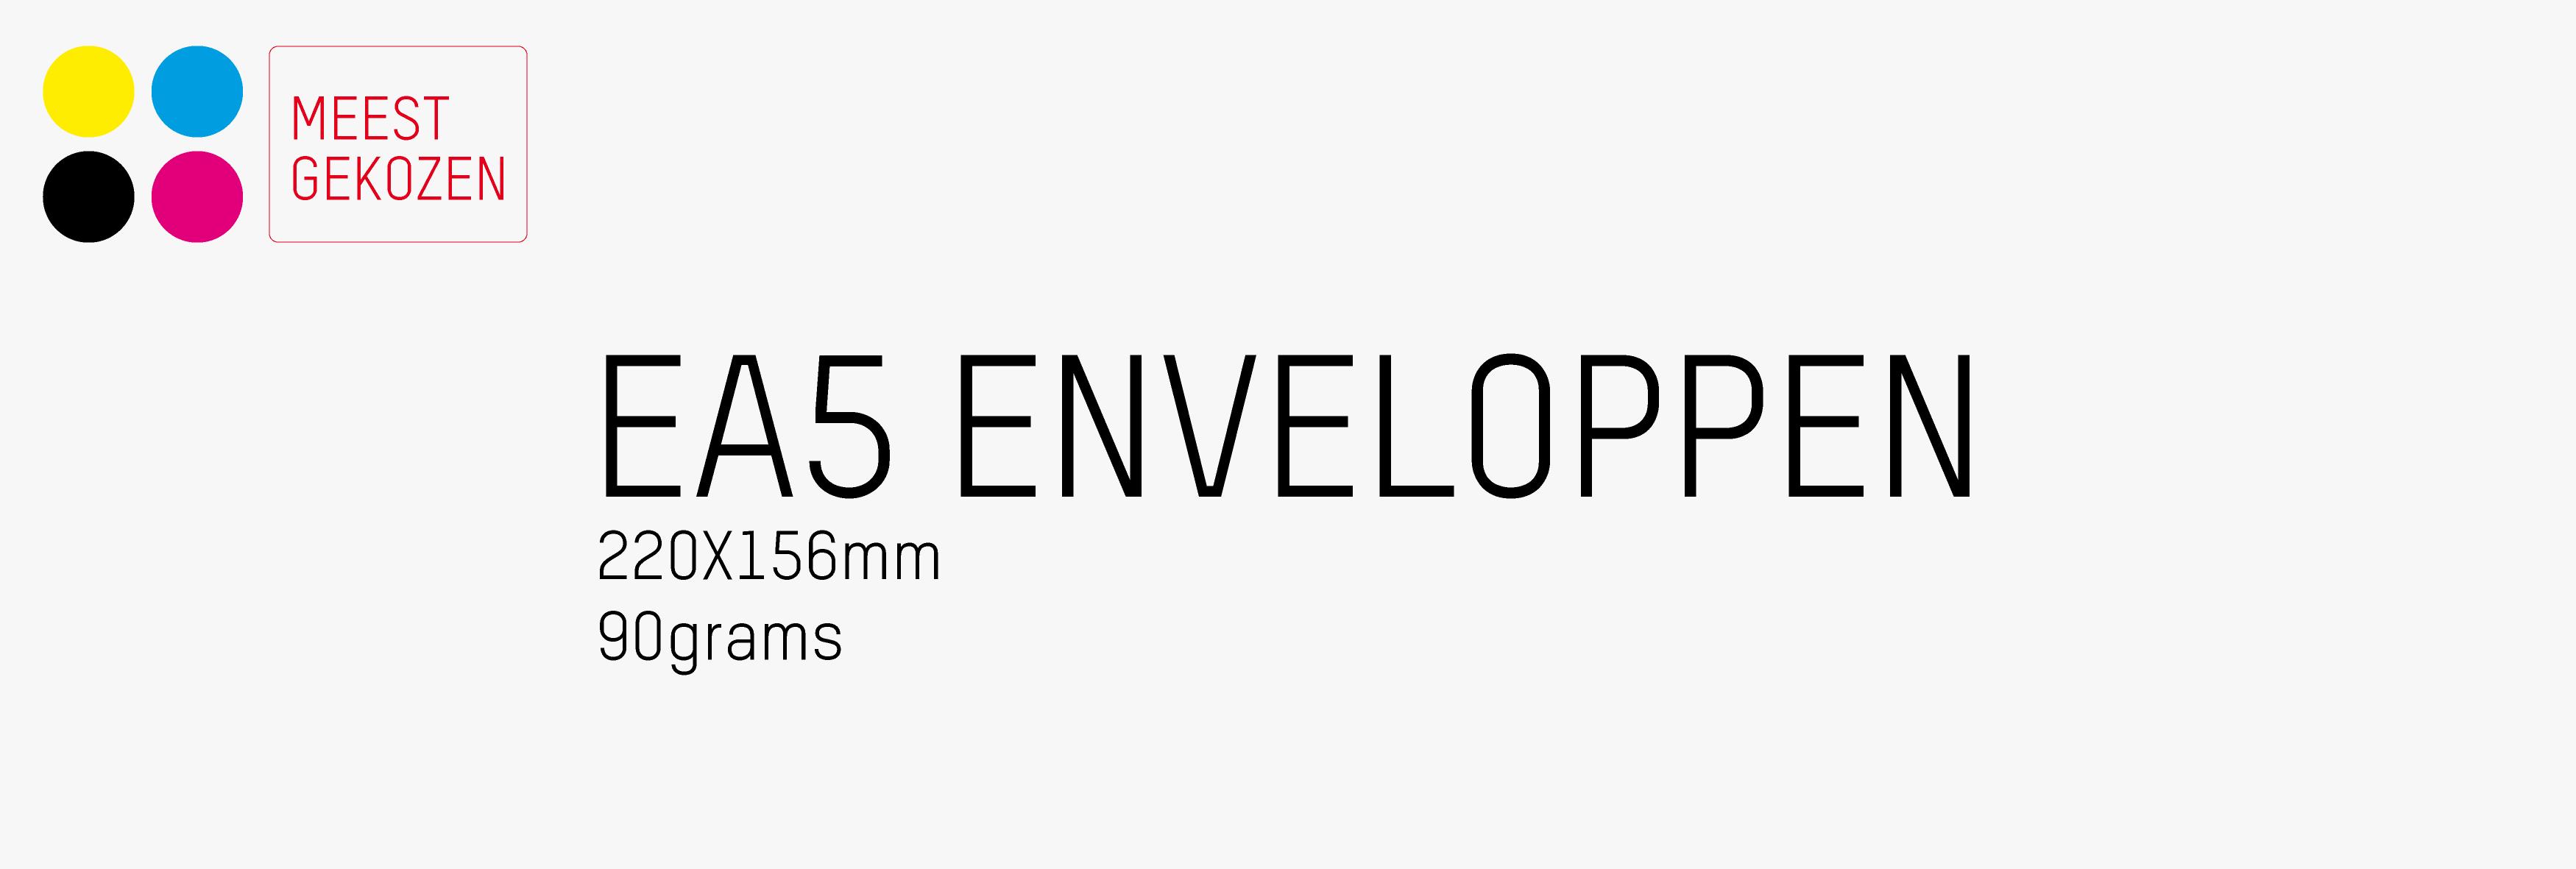 EA5enveloppen